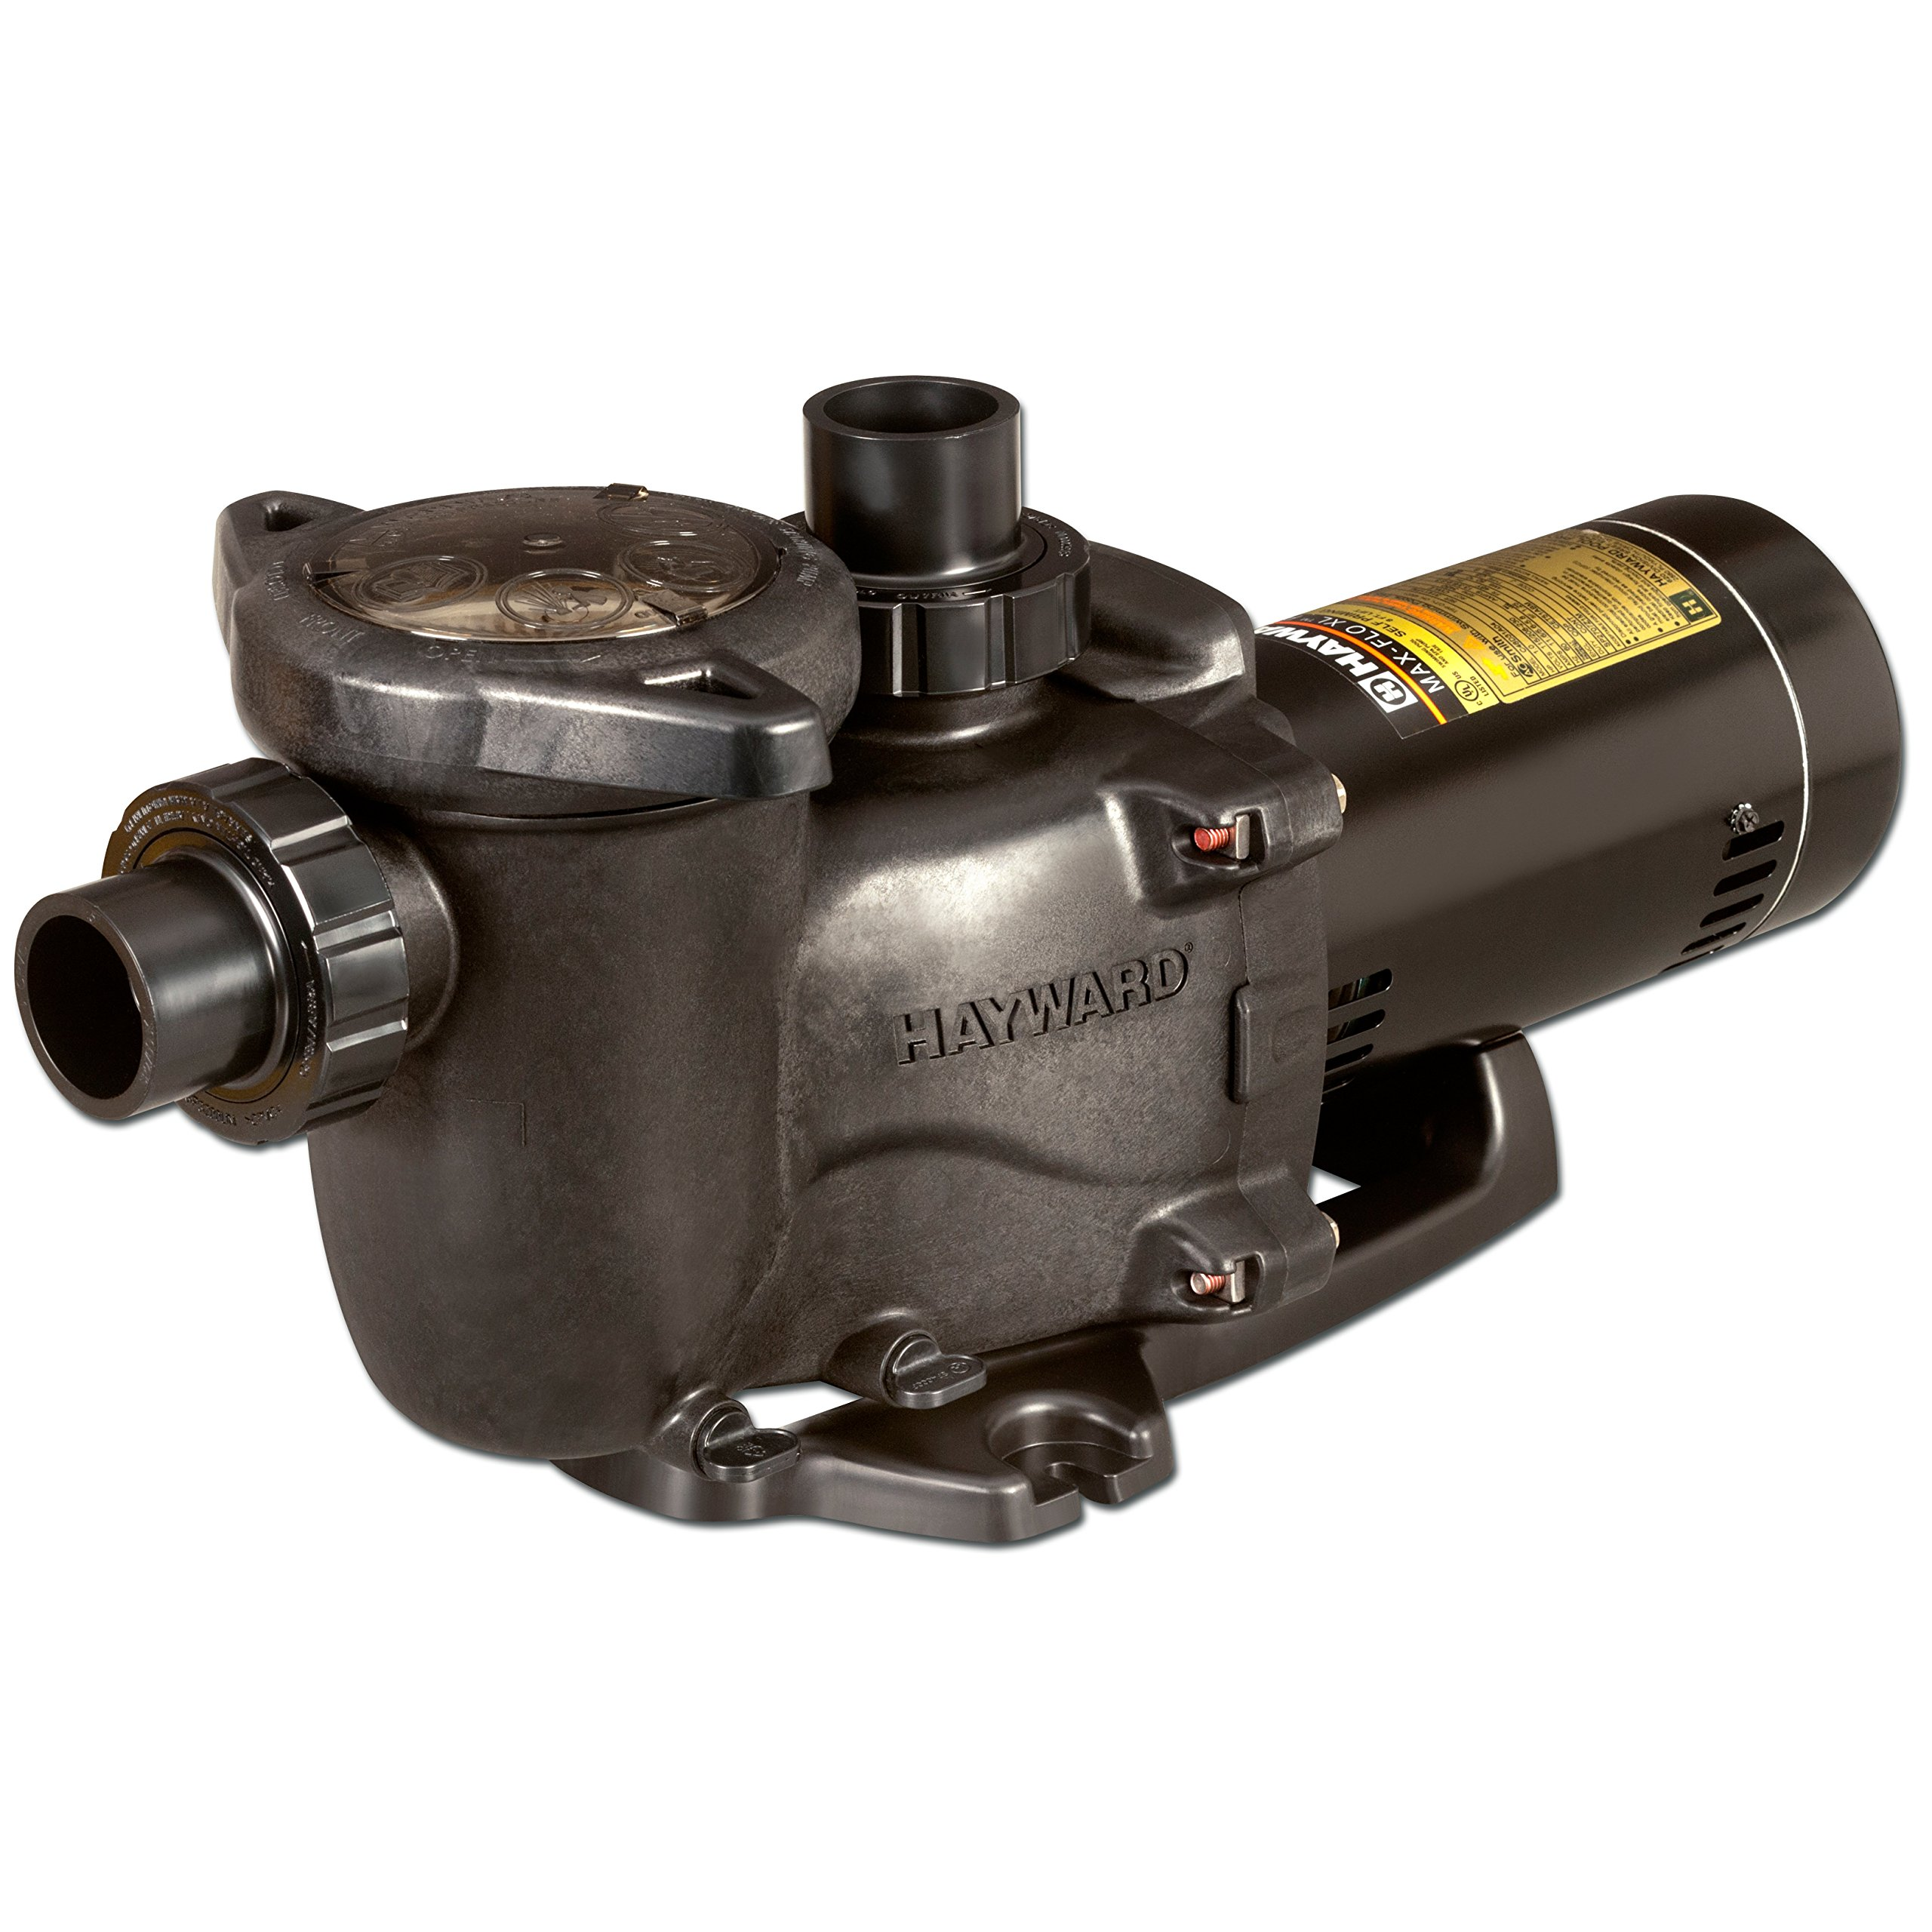 Hayward 1 Horsepower Max-Flo XL In Ground Pool Pump - SP2307X10